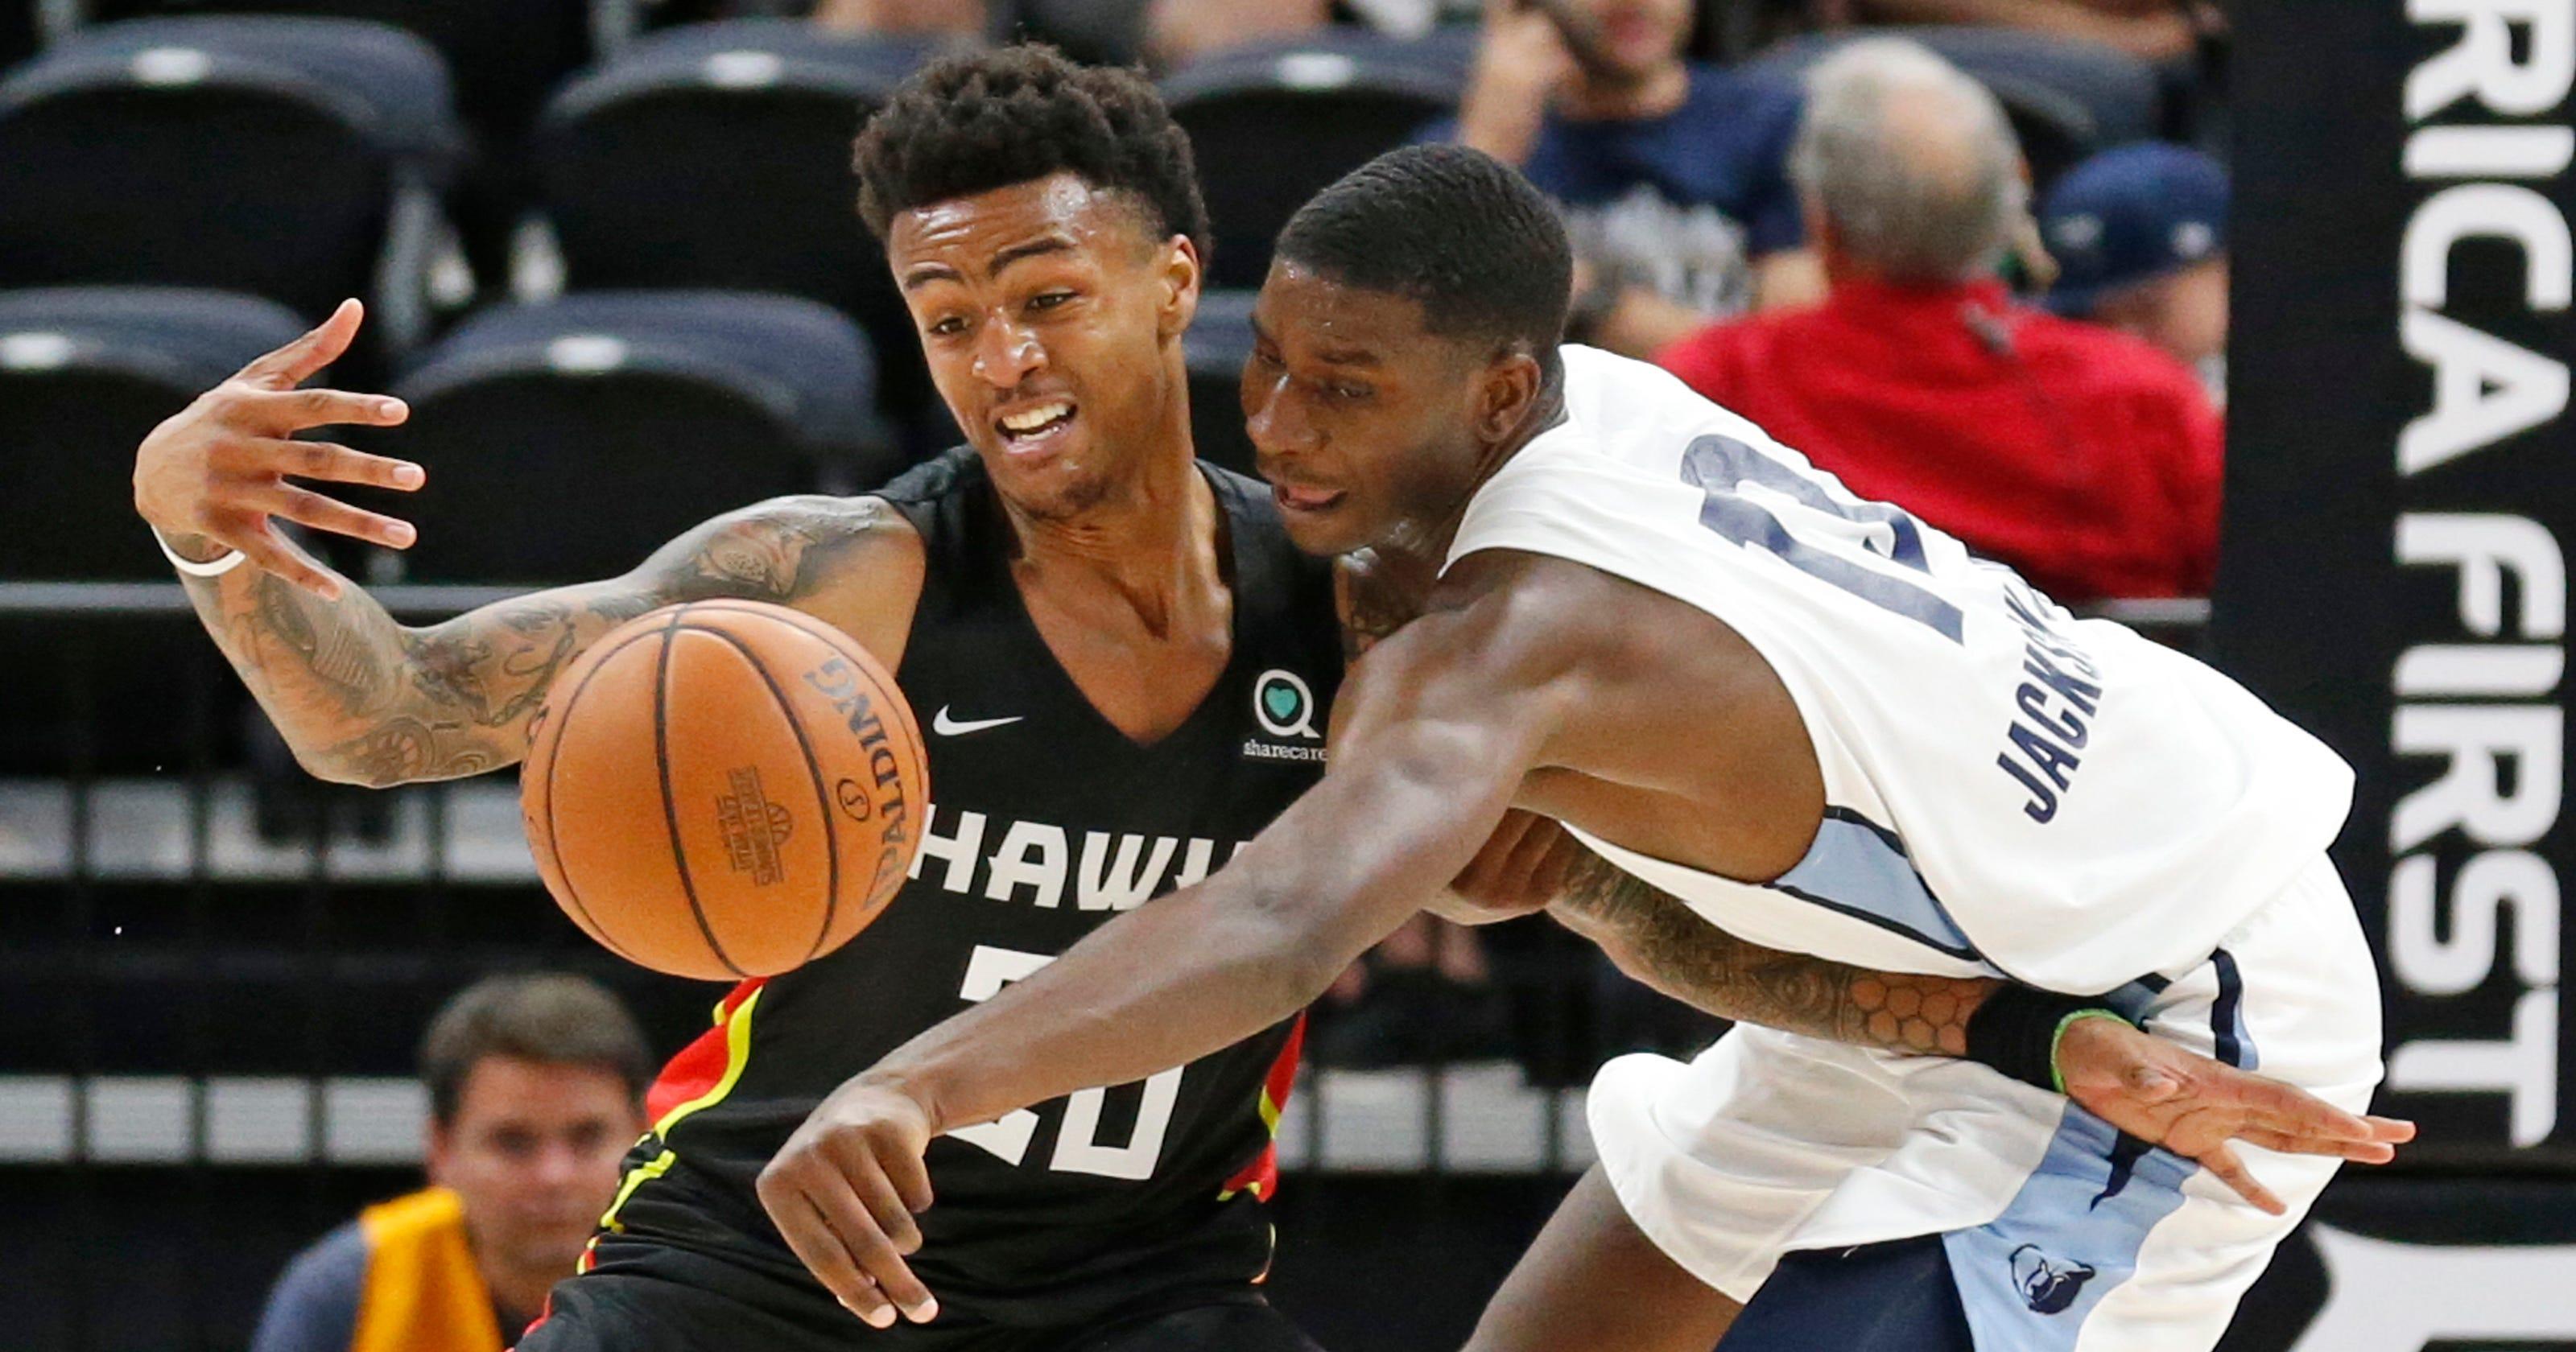 Grizzlies rookie Jaren Jackson Jr. turning heads at NBA Summer League 286ec5fb0